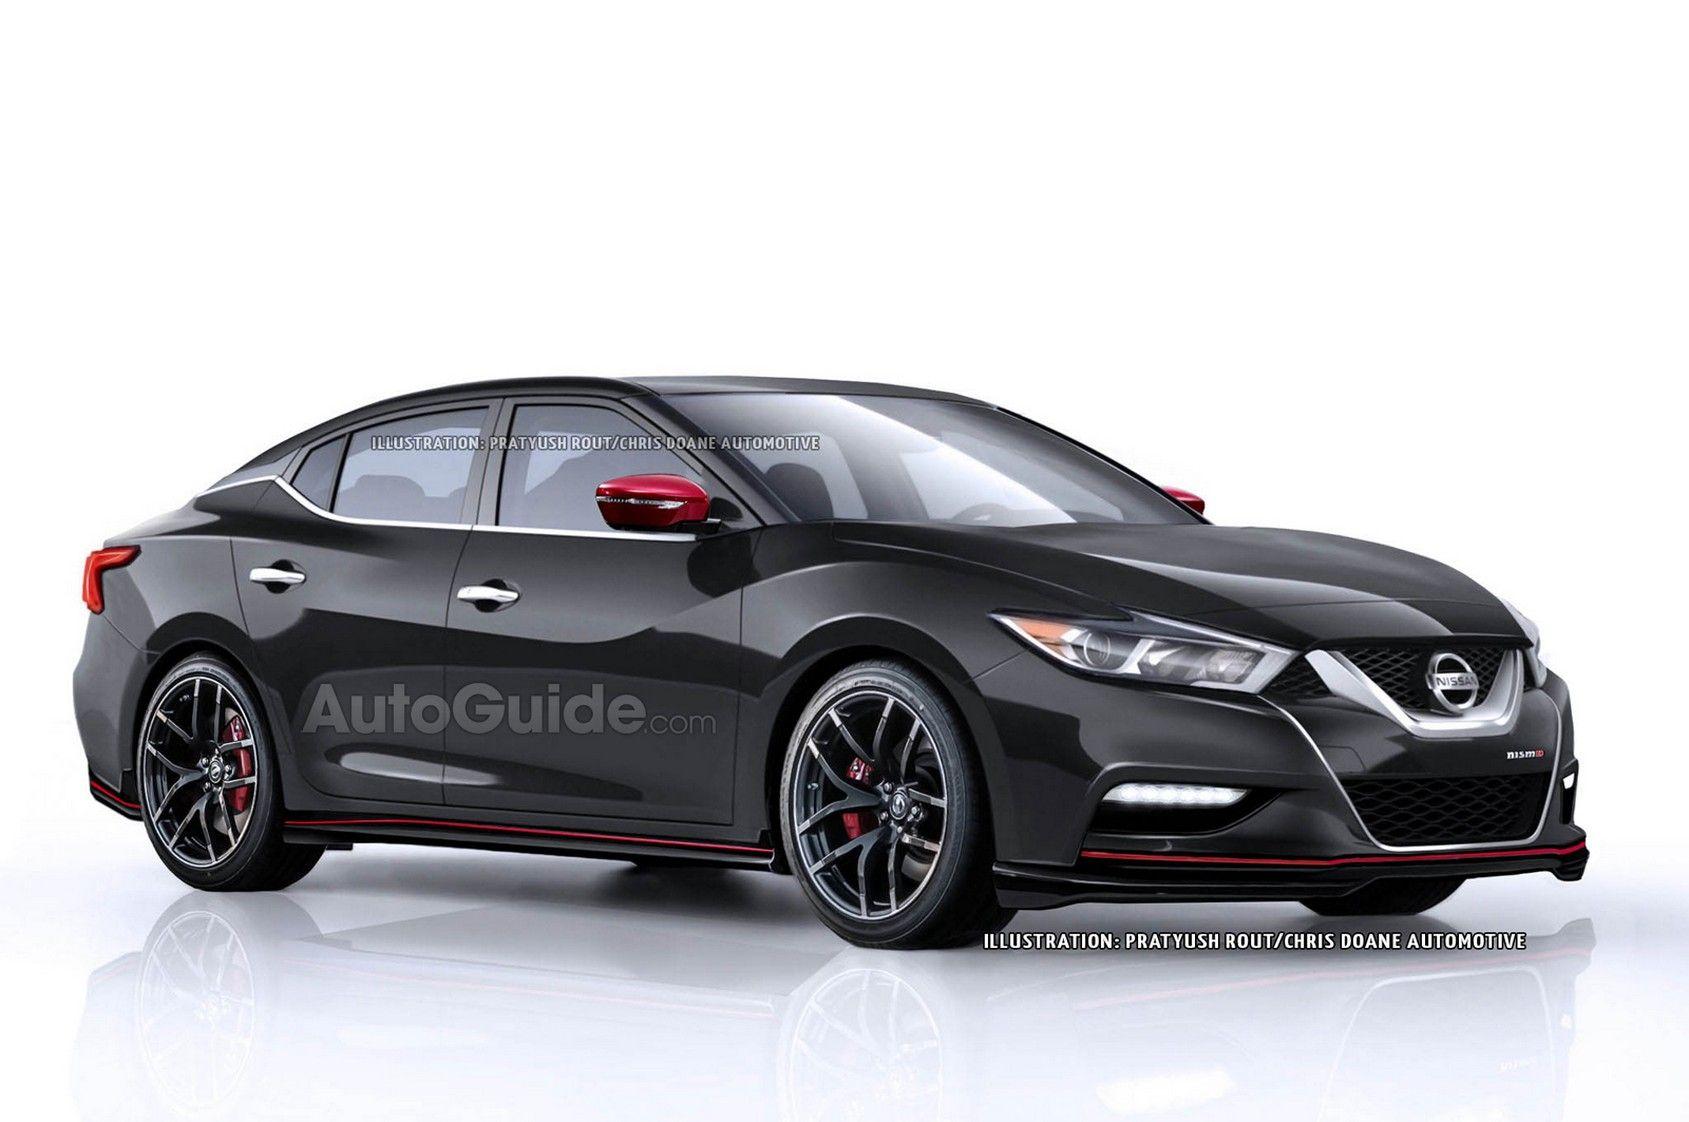 2020 Nissan Maxima Nismo, Price, Concept 2020 Nissan